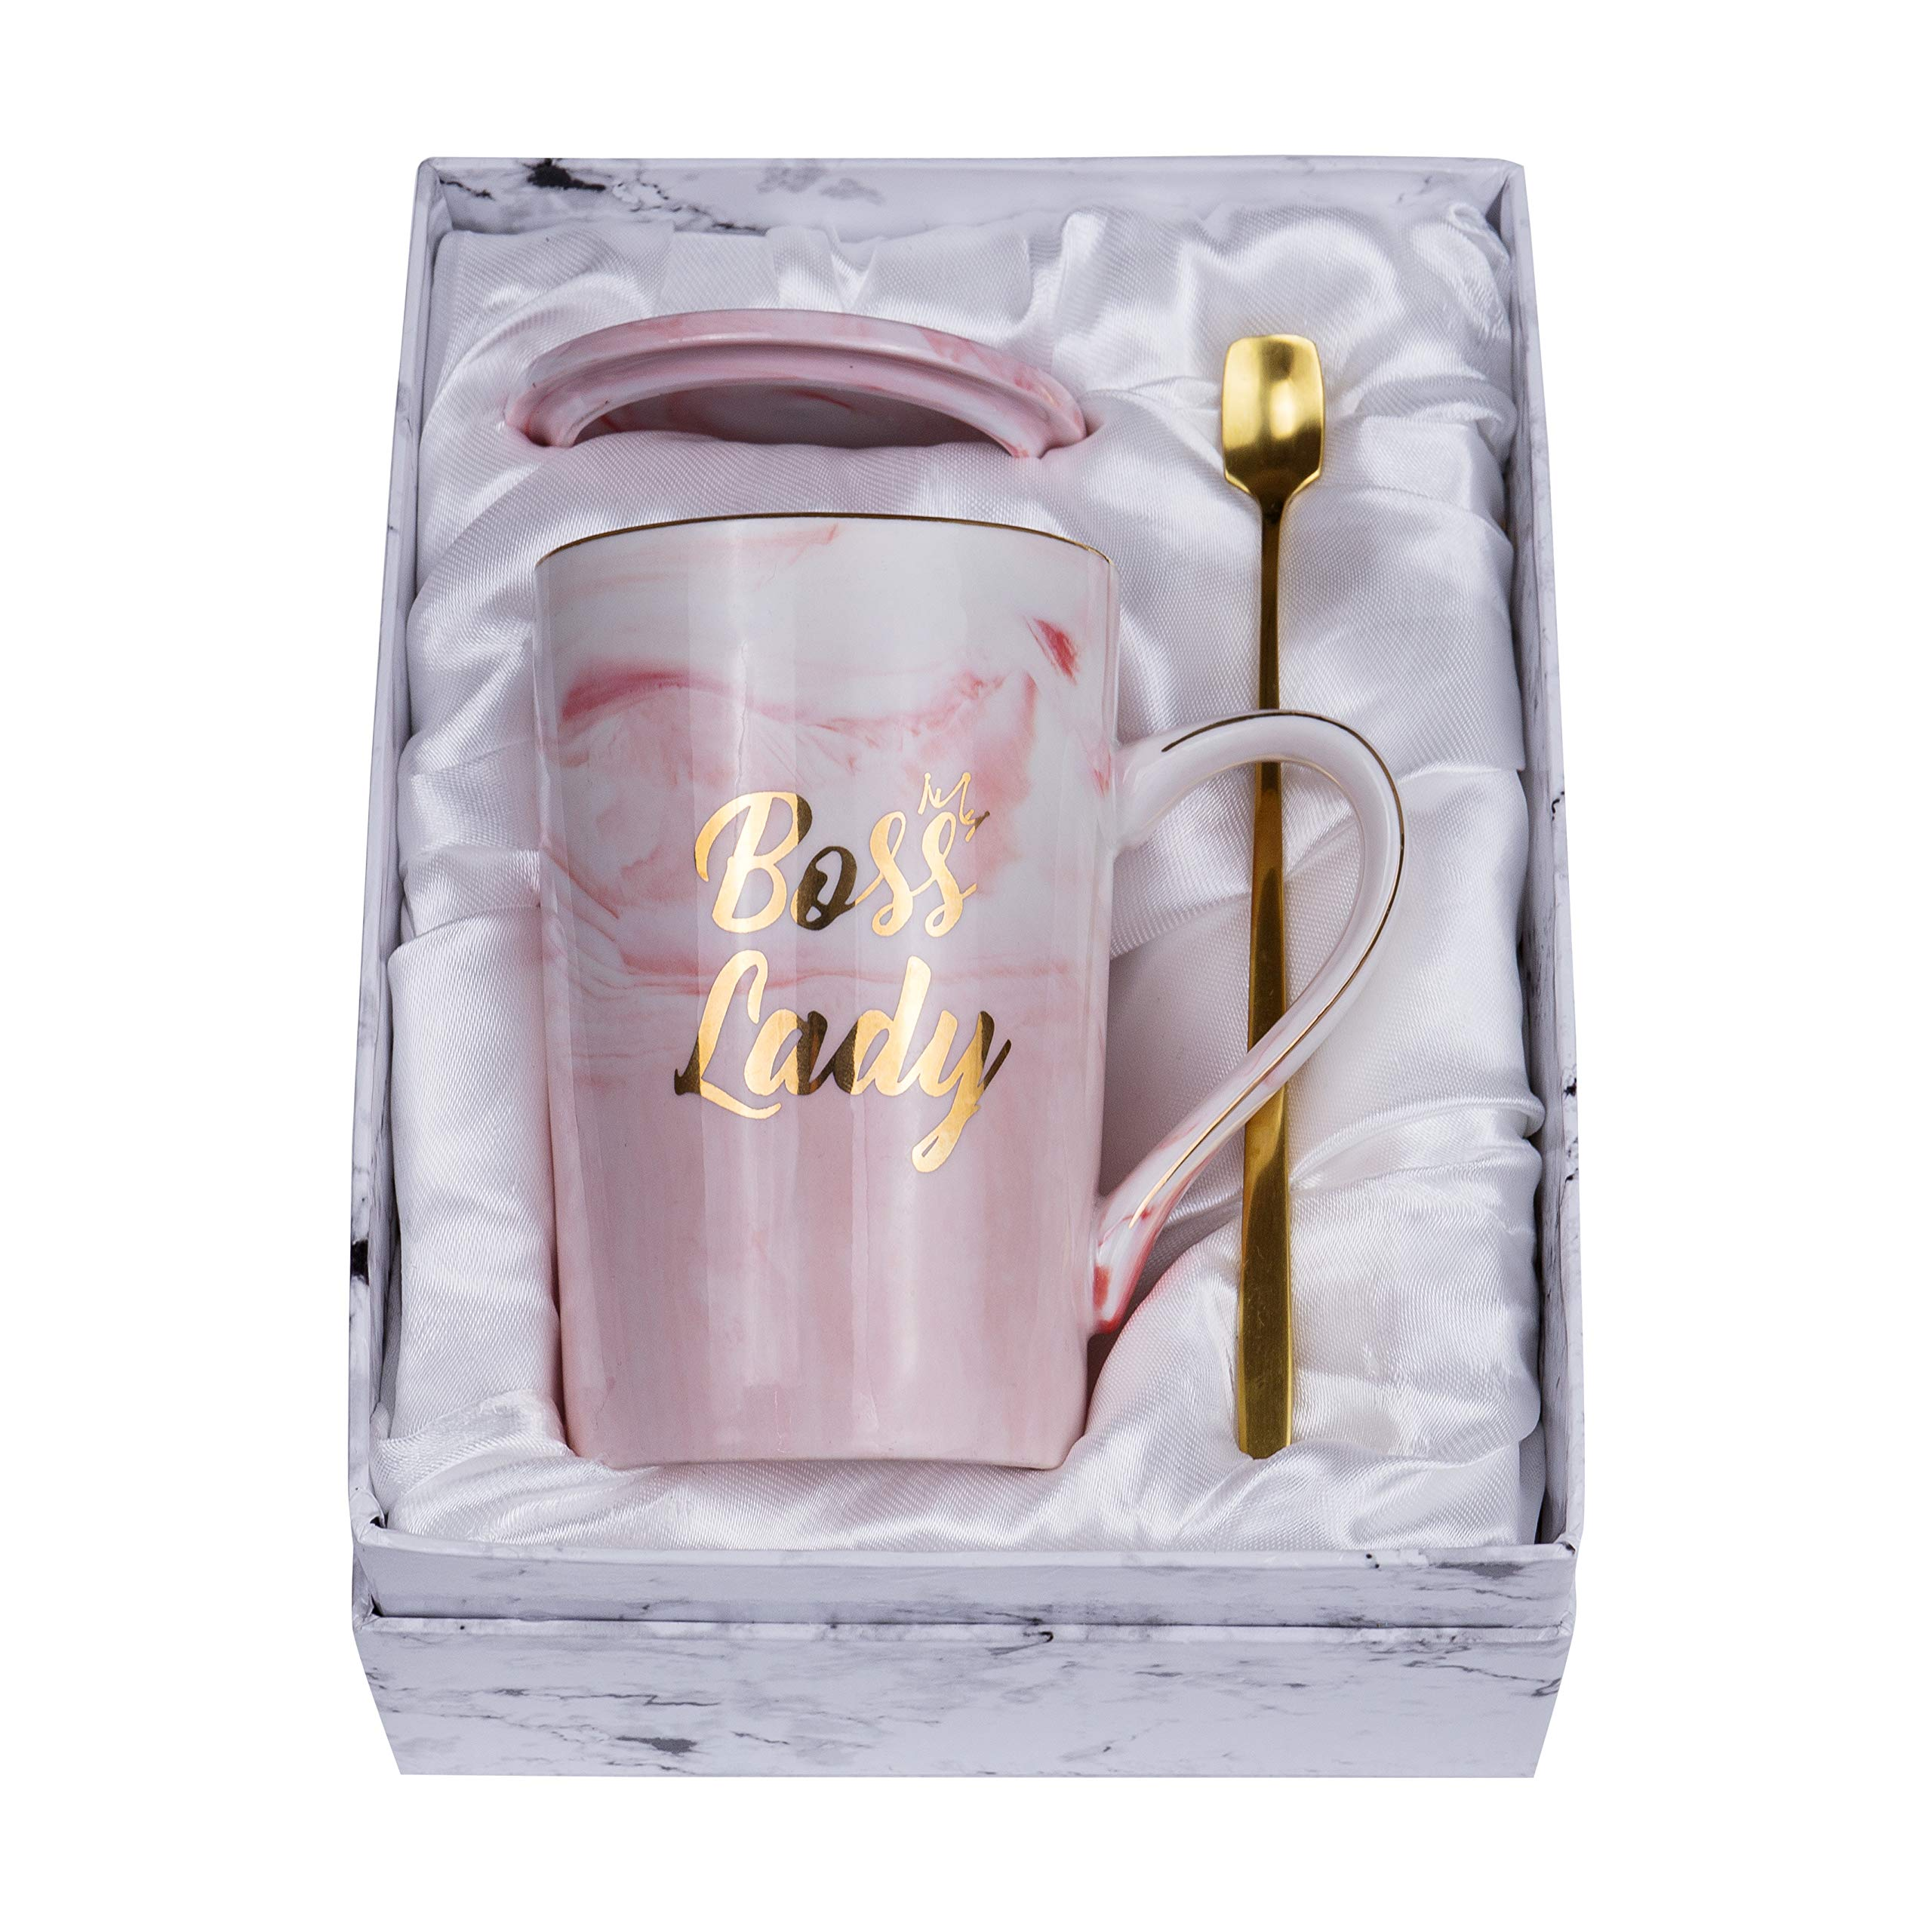 Jumway Boss Lady Mugs - Best Gift for Mom and Female Boss Friend - Boss gifts Birthday Gifts for Women Boss Mom 14oz Marble Ceramic Coffee mug